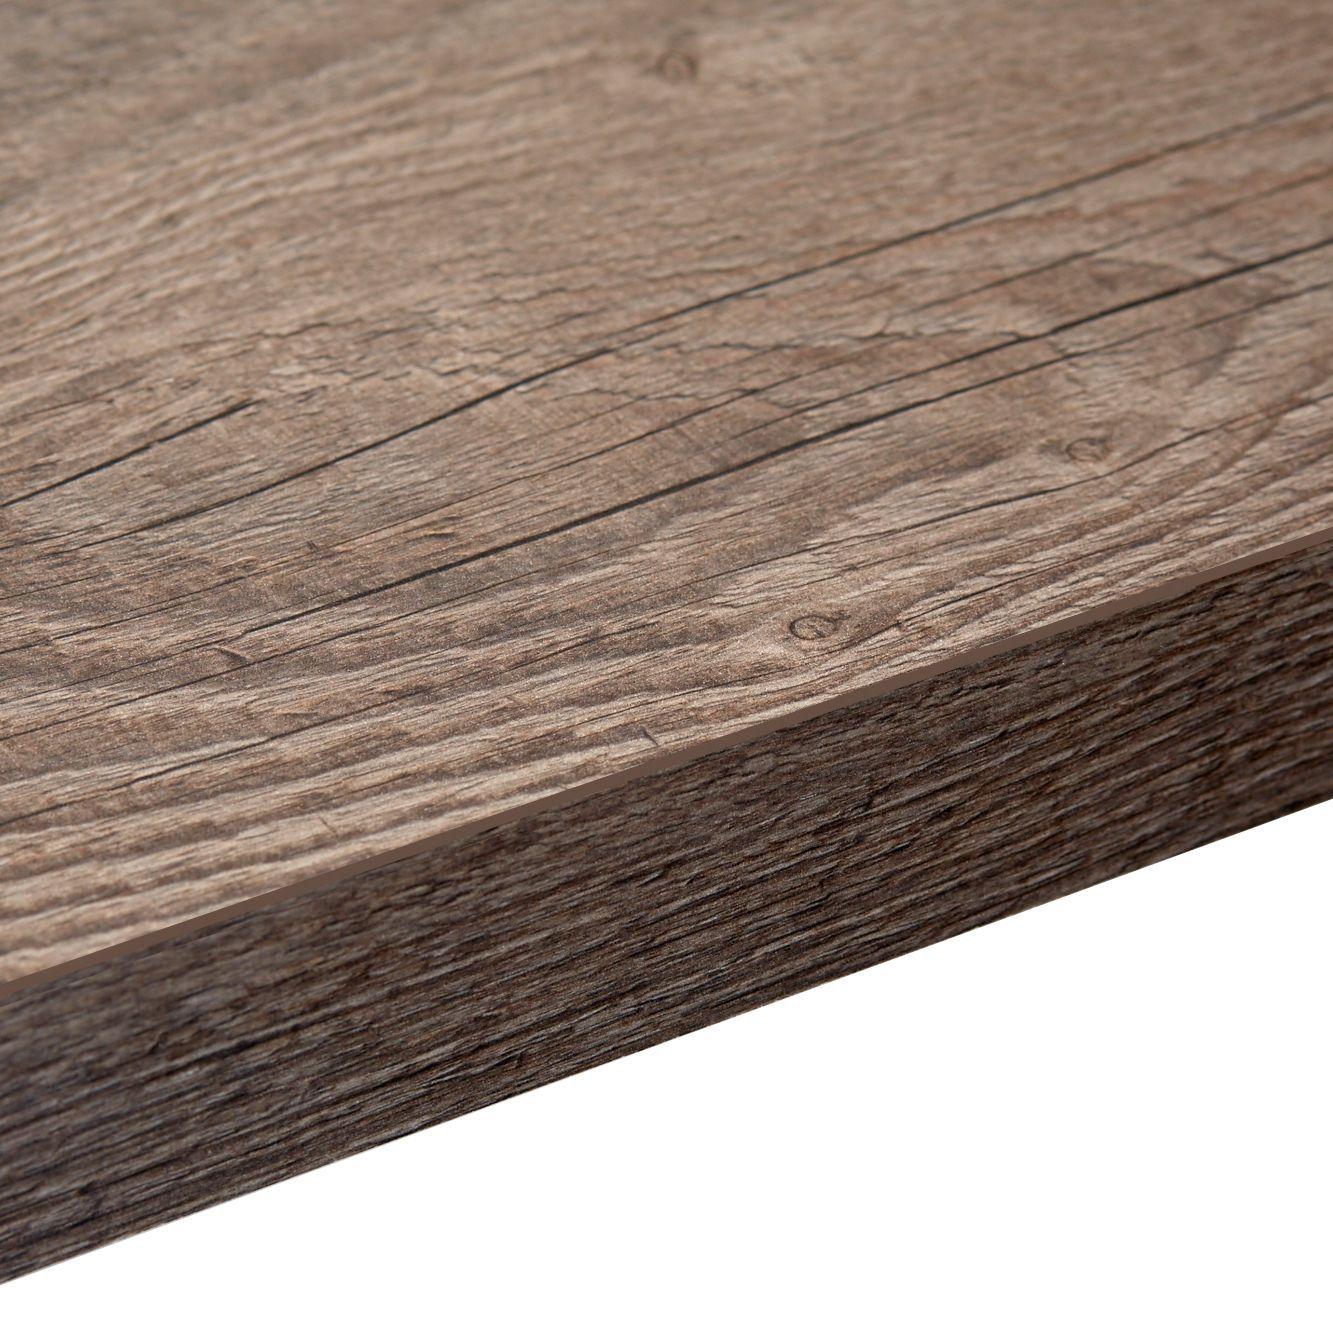 38mm b q mountain timber laminate wood effect square edge. Black Bedroom Furniture Sets. Home Design Ideas